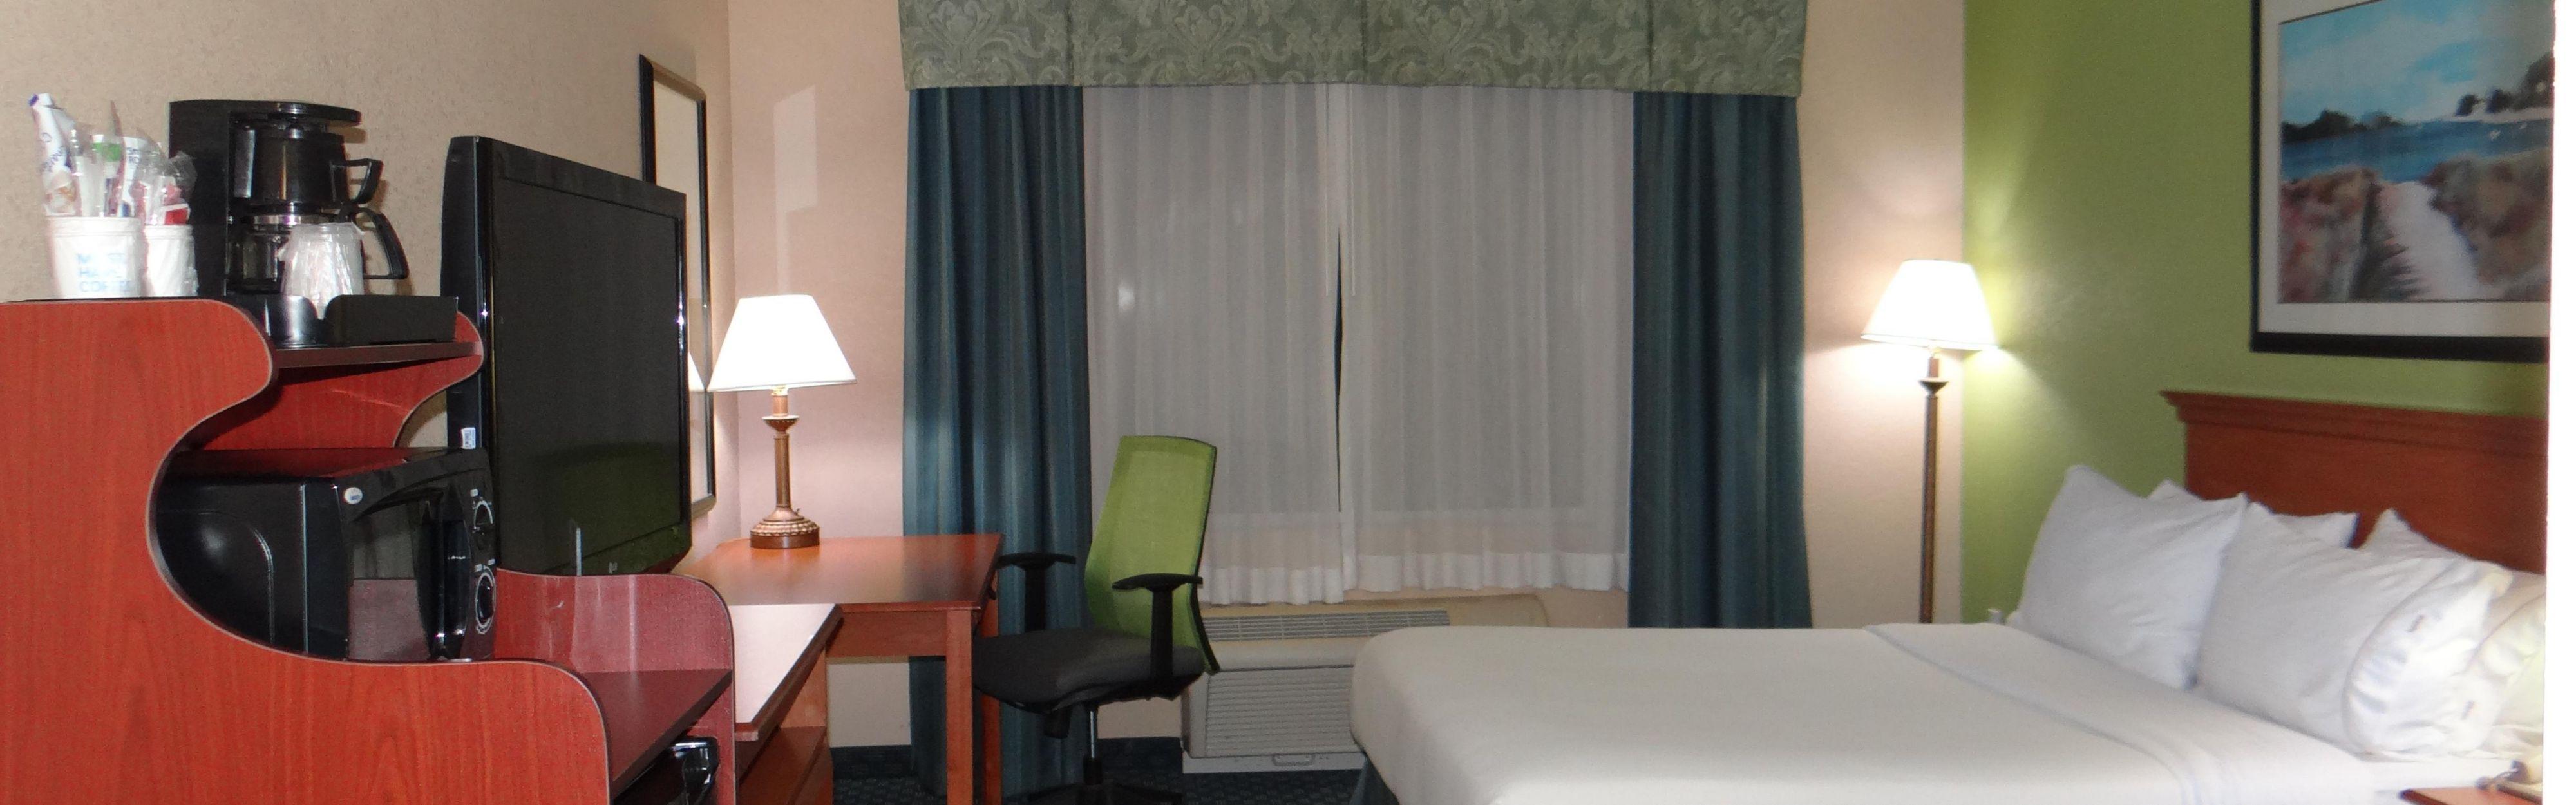 Holiday Inn Express Salisbury - Delmar image 1